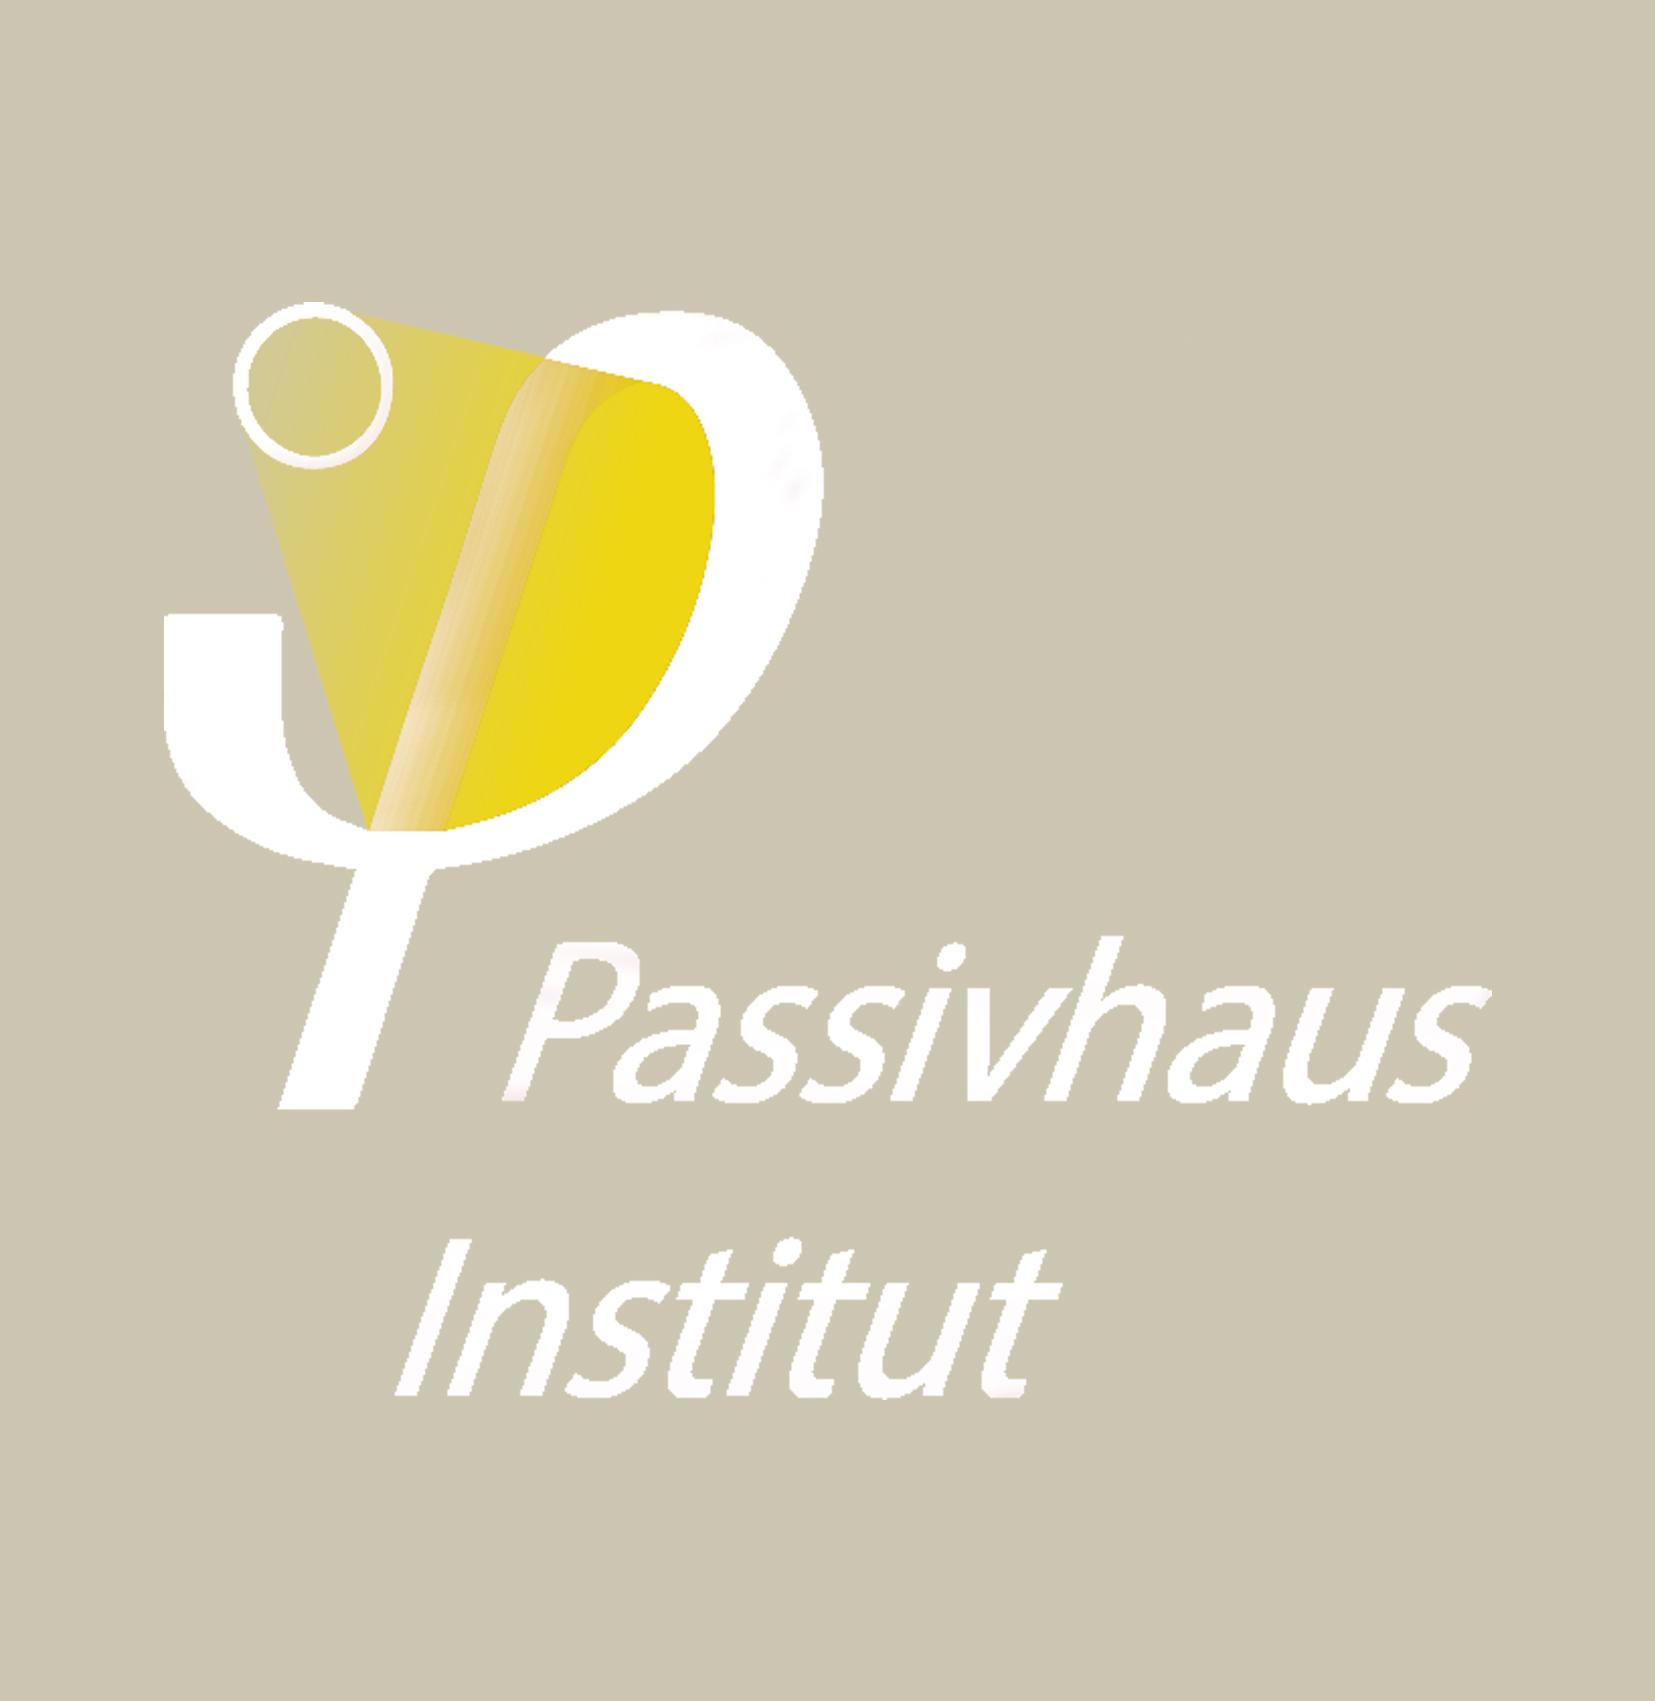 Nos engagements environnementaux, label passivhaus